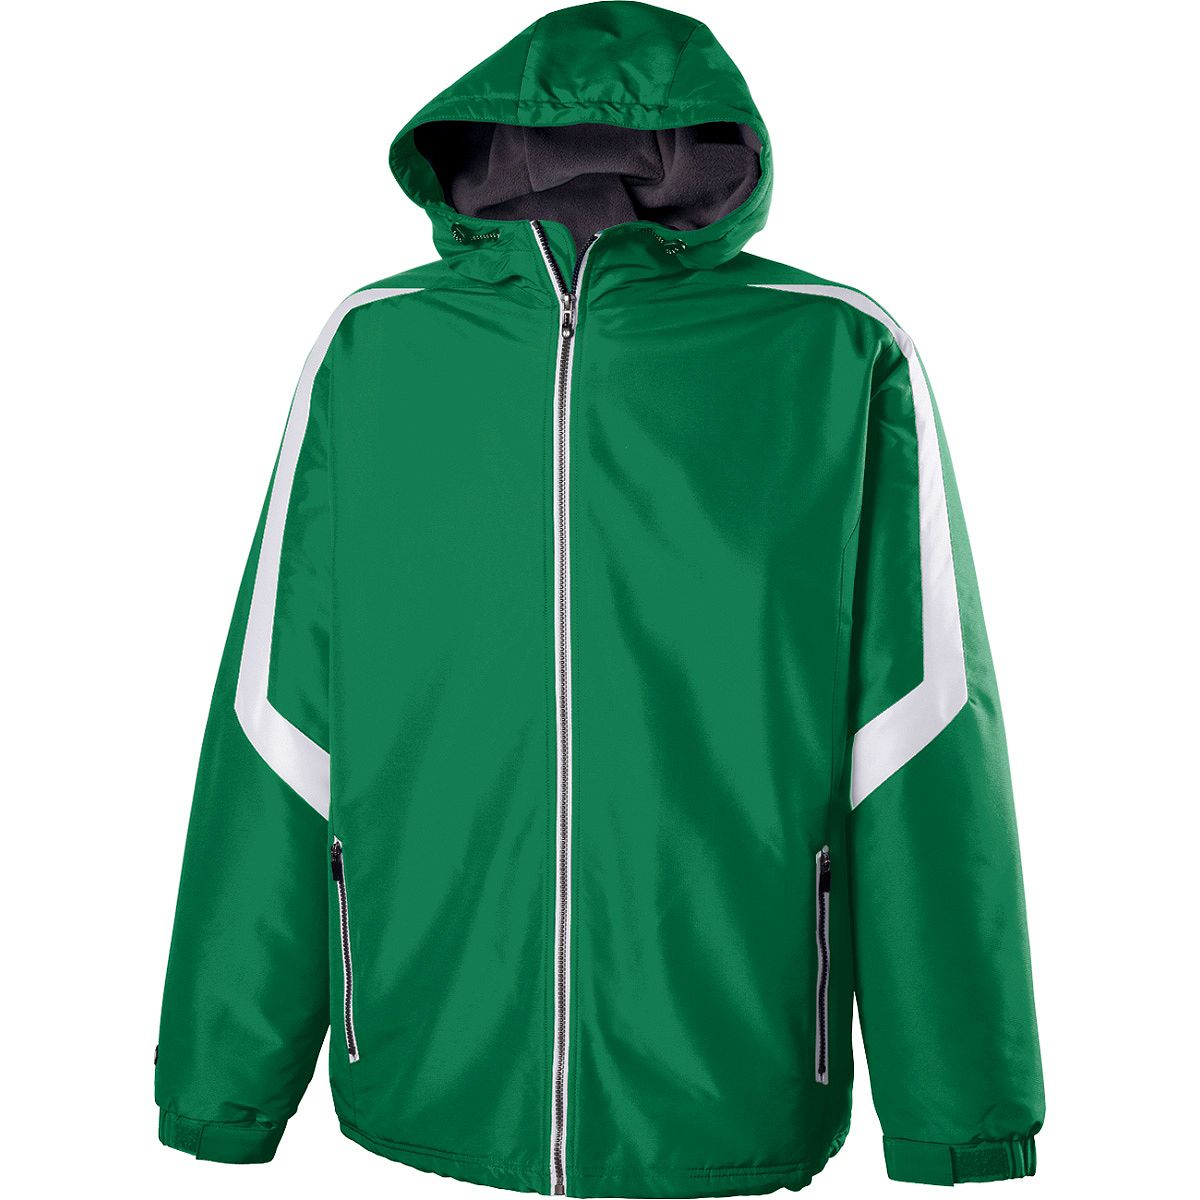 Holloway Charger Jacket Kel/Whi 2Xl - image 1 of 1